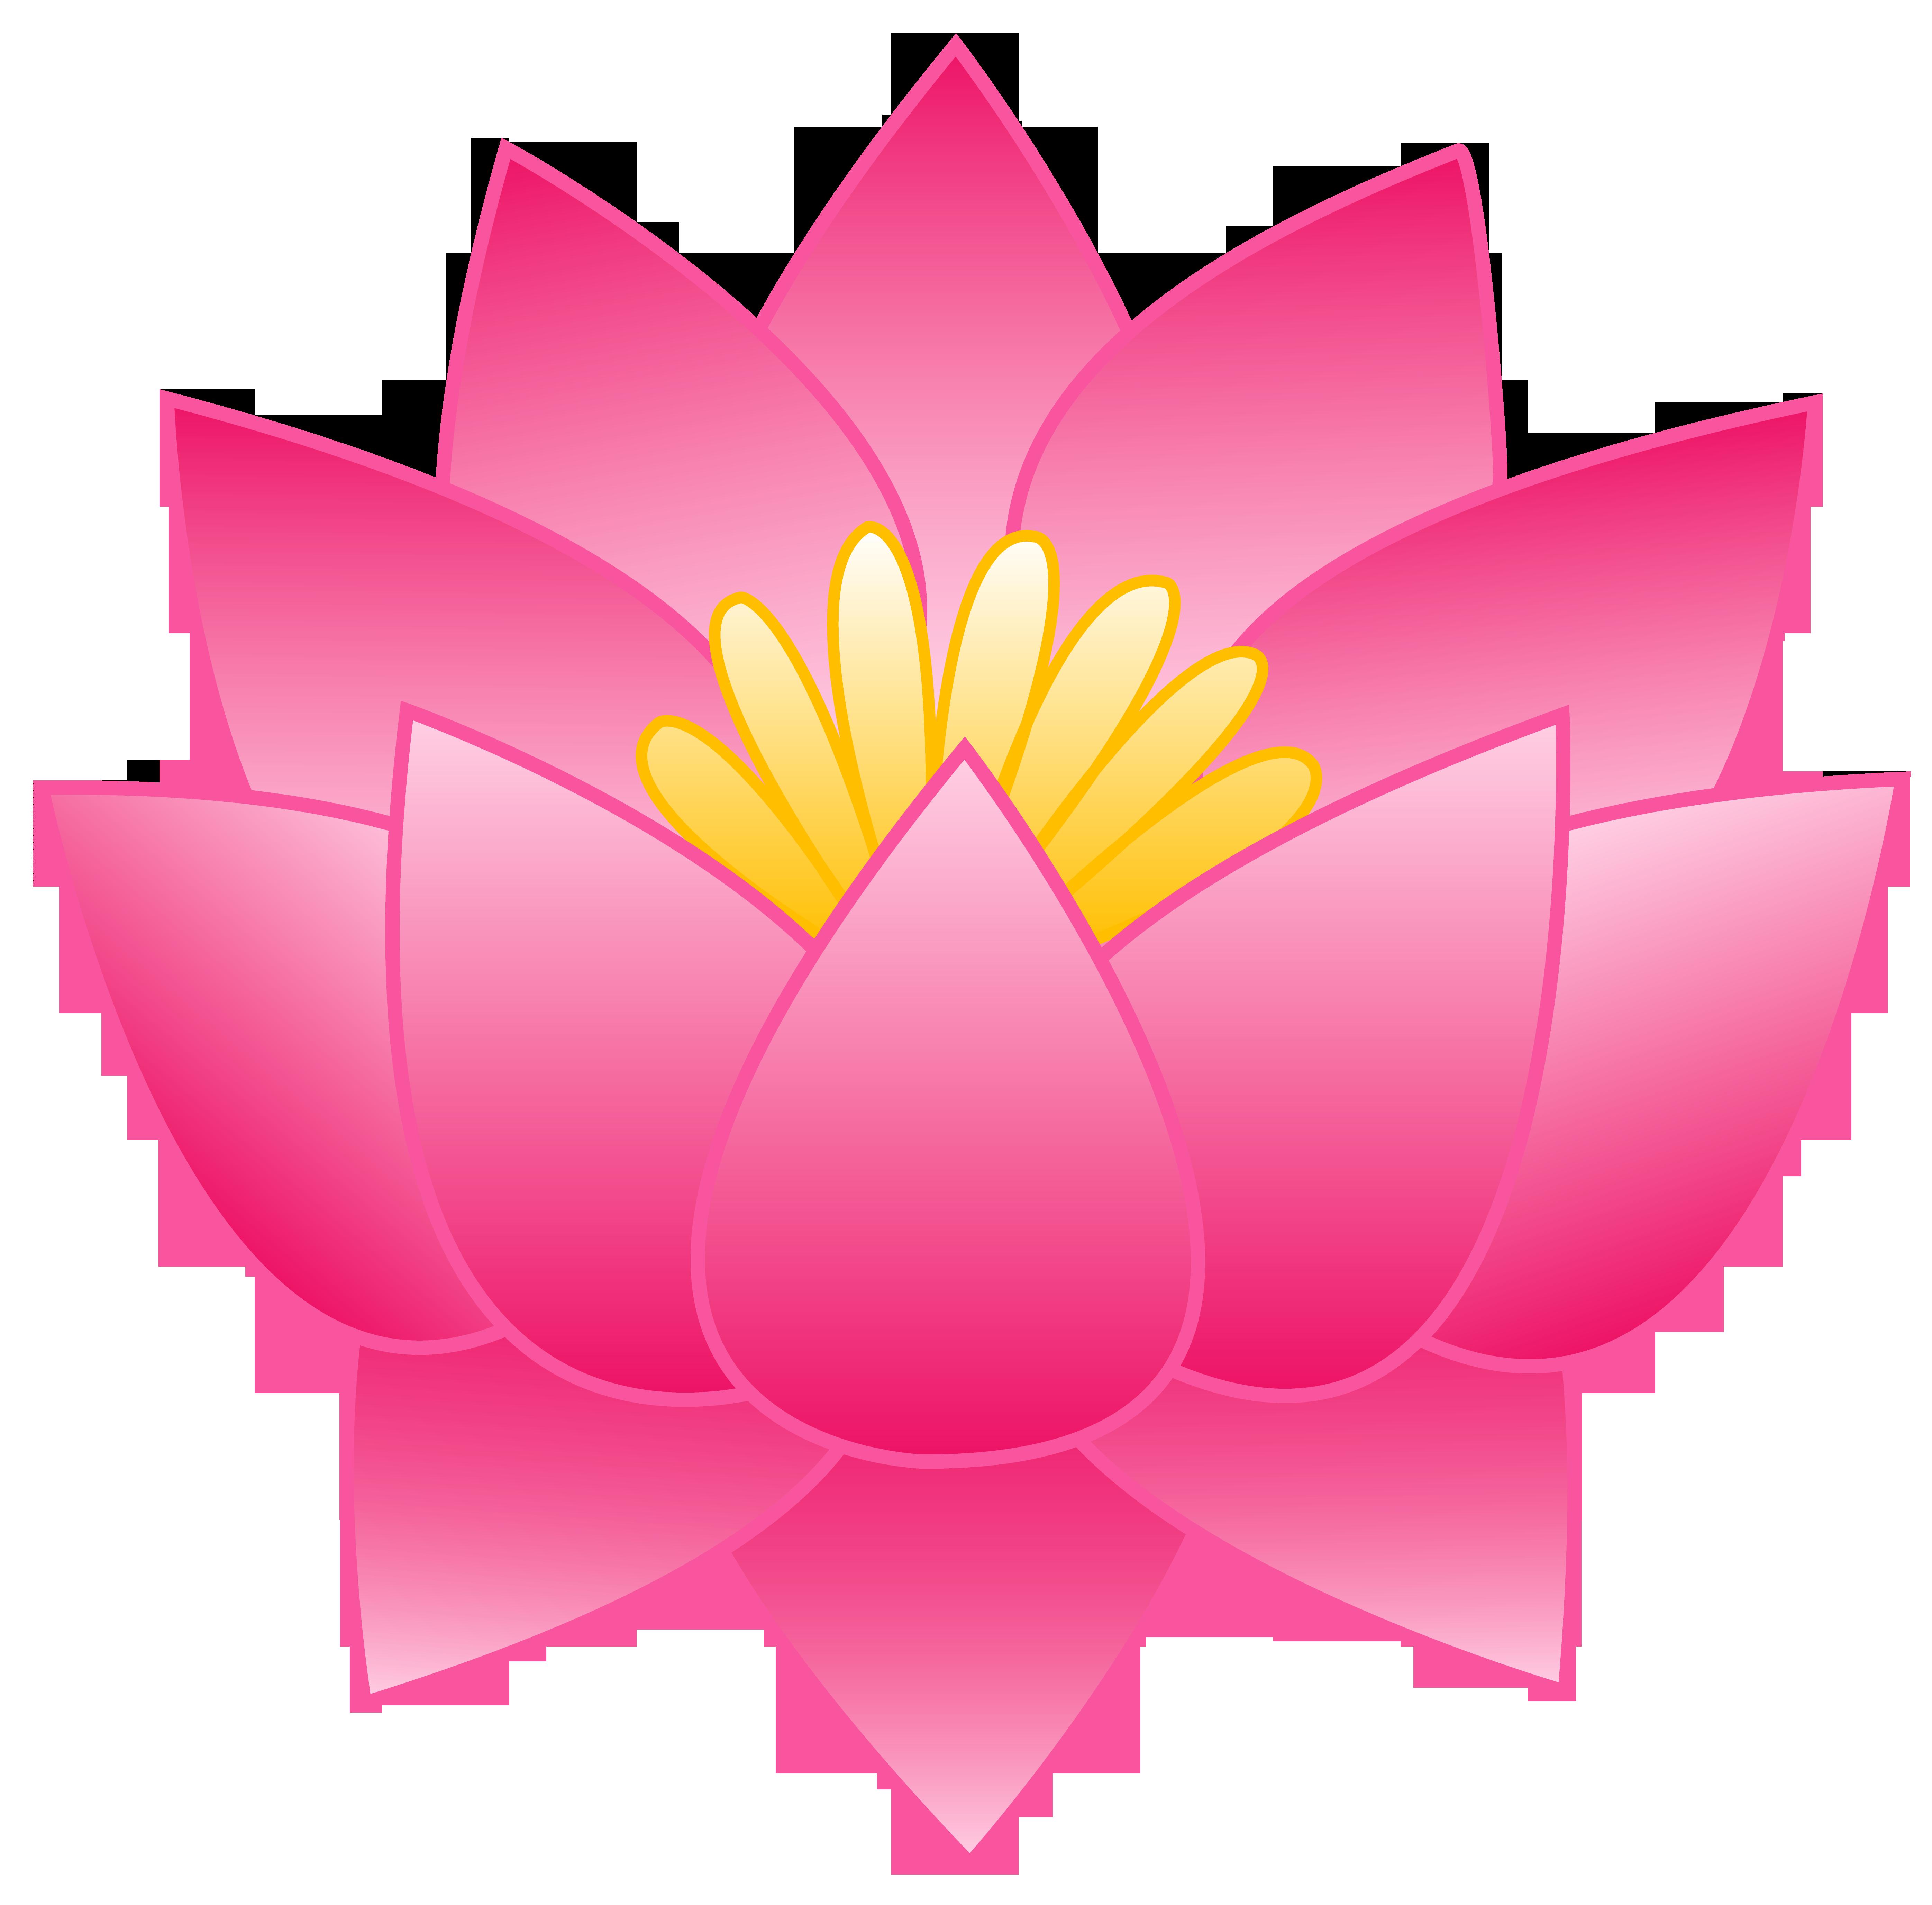 Flowers cartoon pictures free download best flowers cartoon 5584x5505 pink lotus flower mightylinksfo